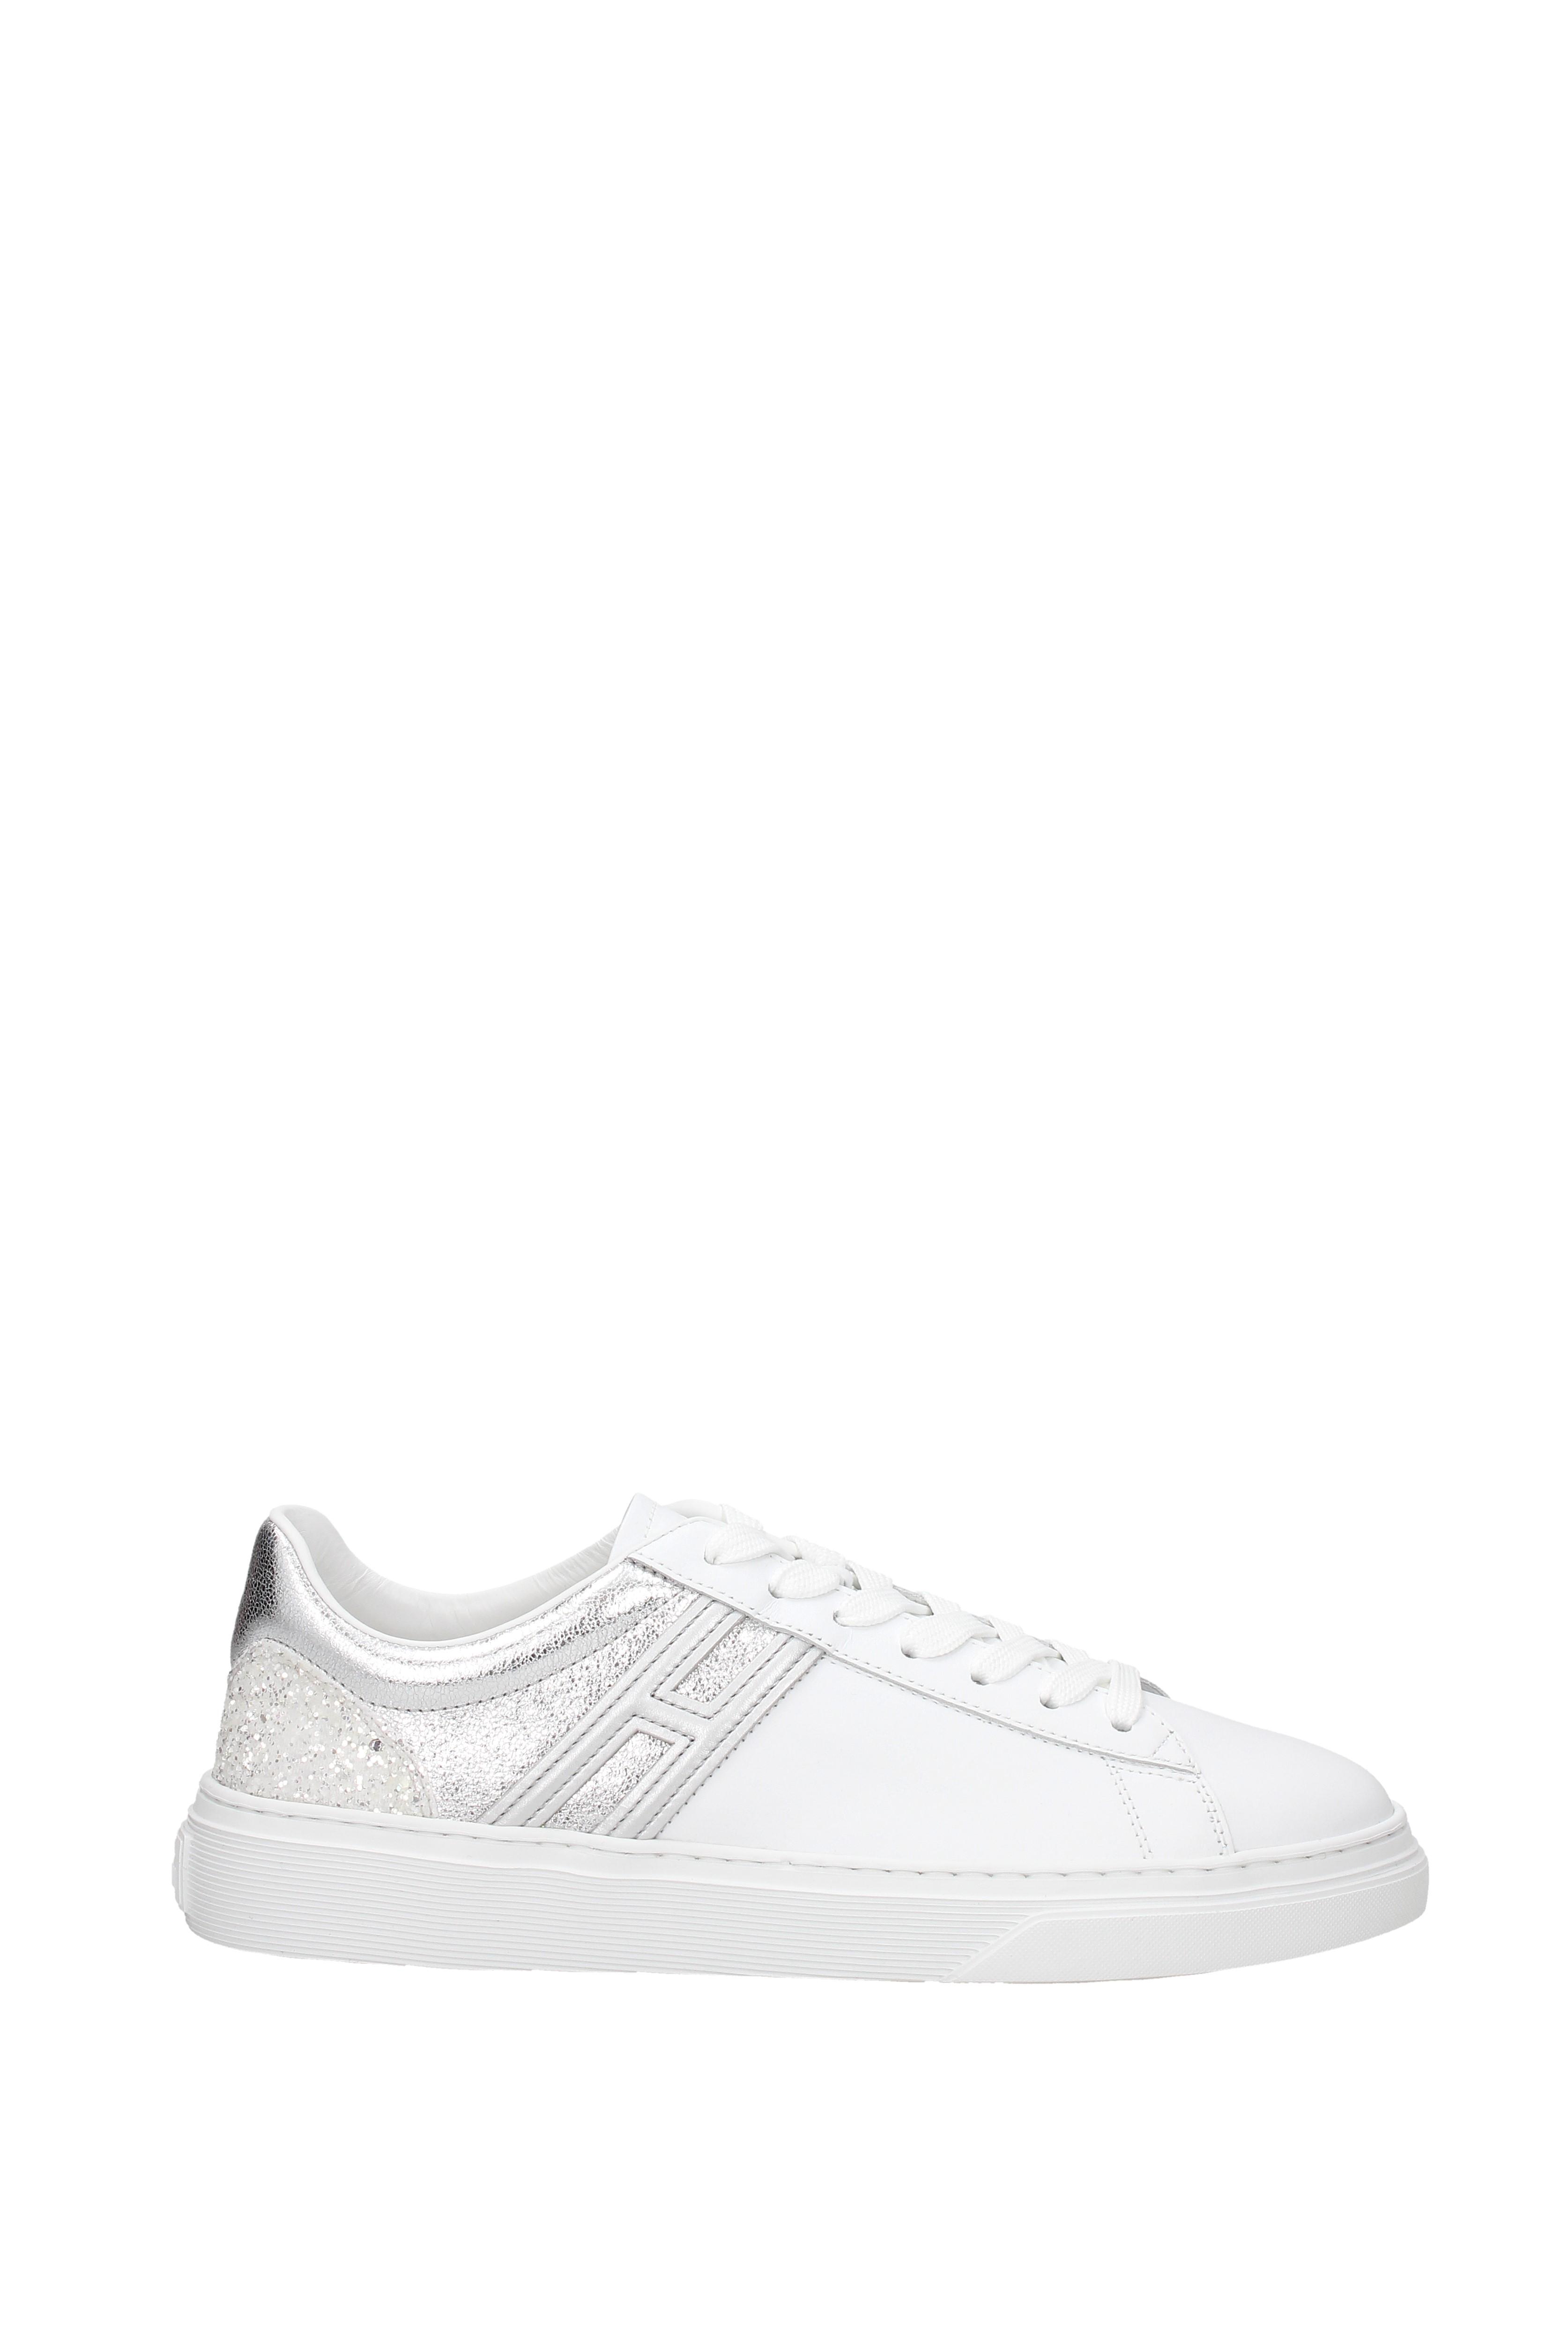 Sneakers Hogan Hogan Sneakers Damen - Leder (HXW3650J970III) 5d2816